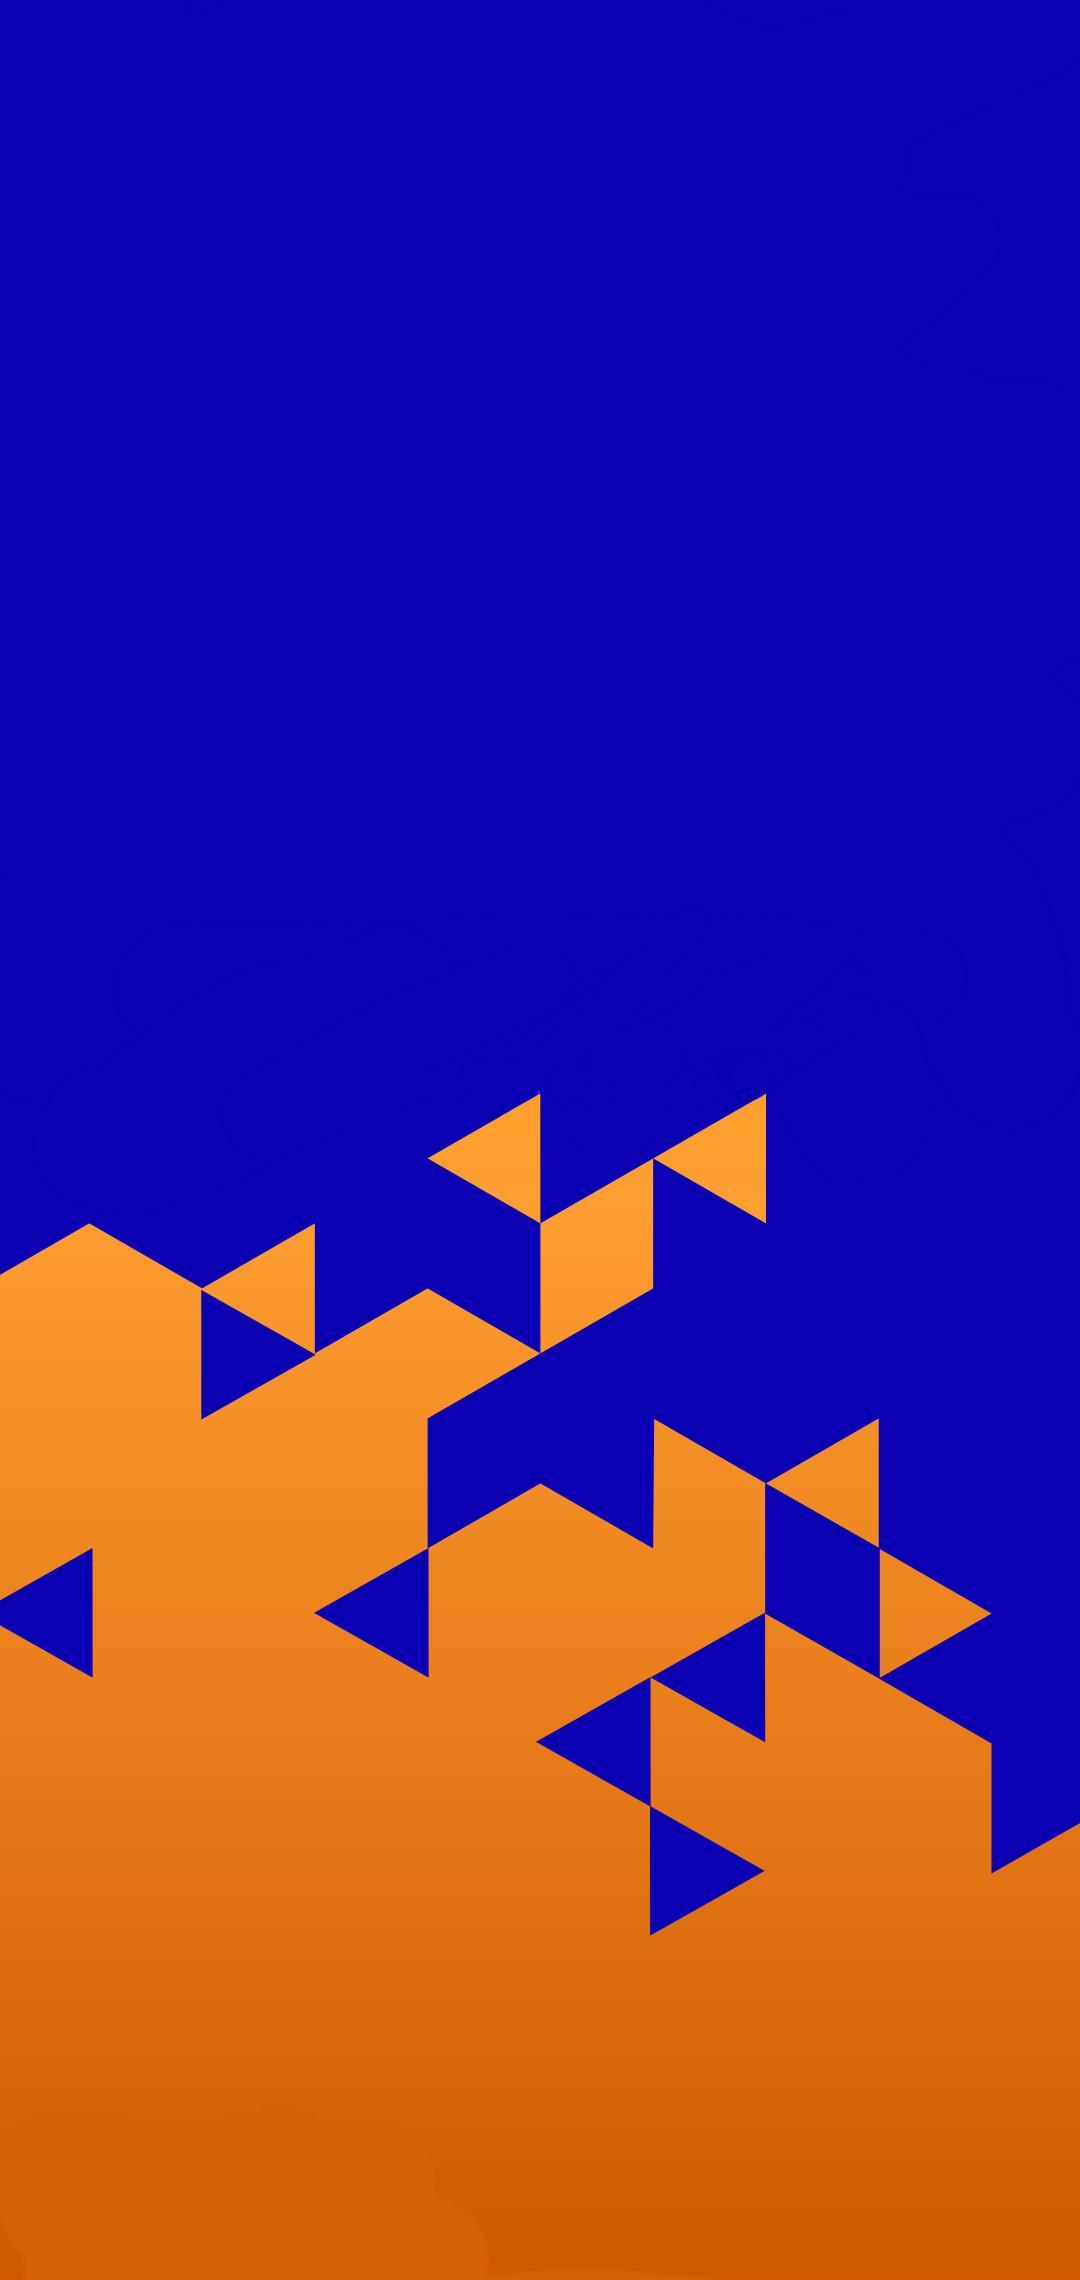 McLaren phone wallpaper formula1 1080x2280